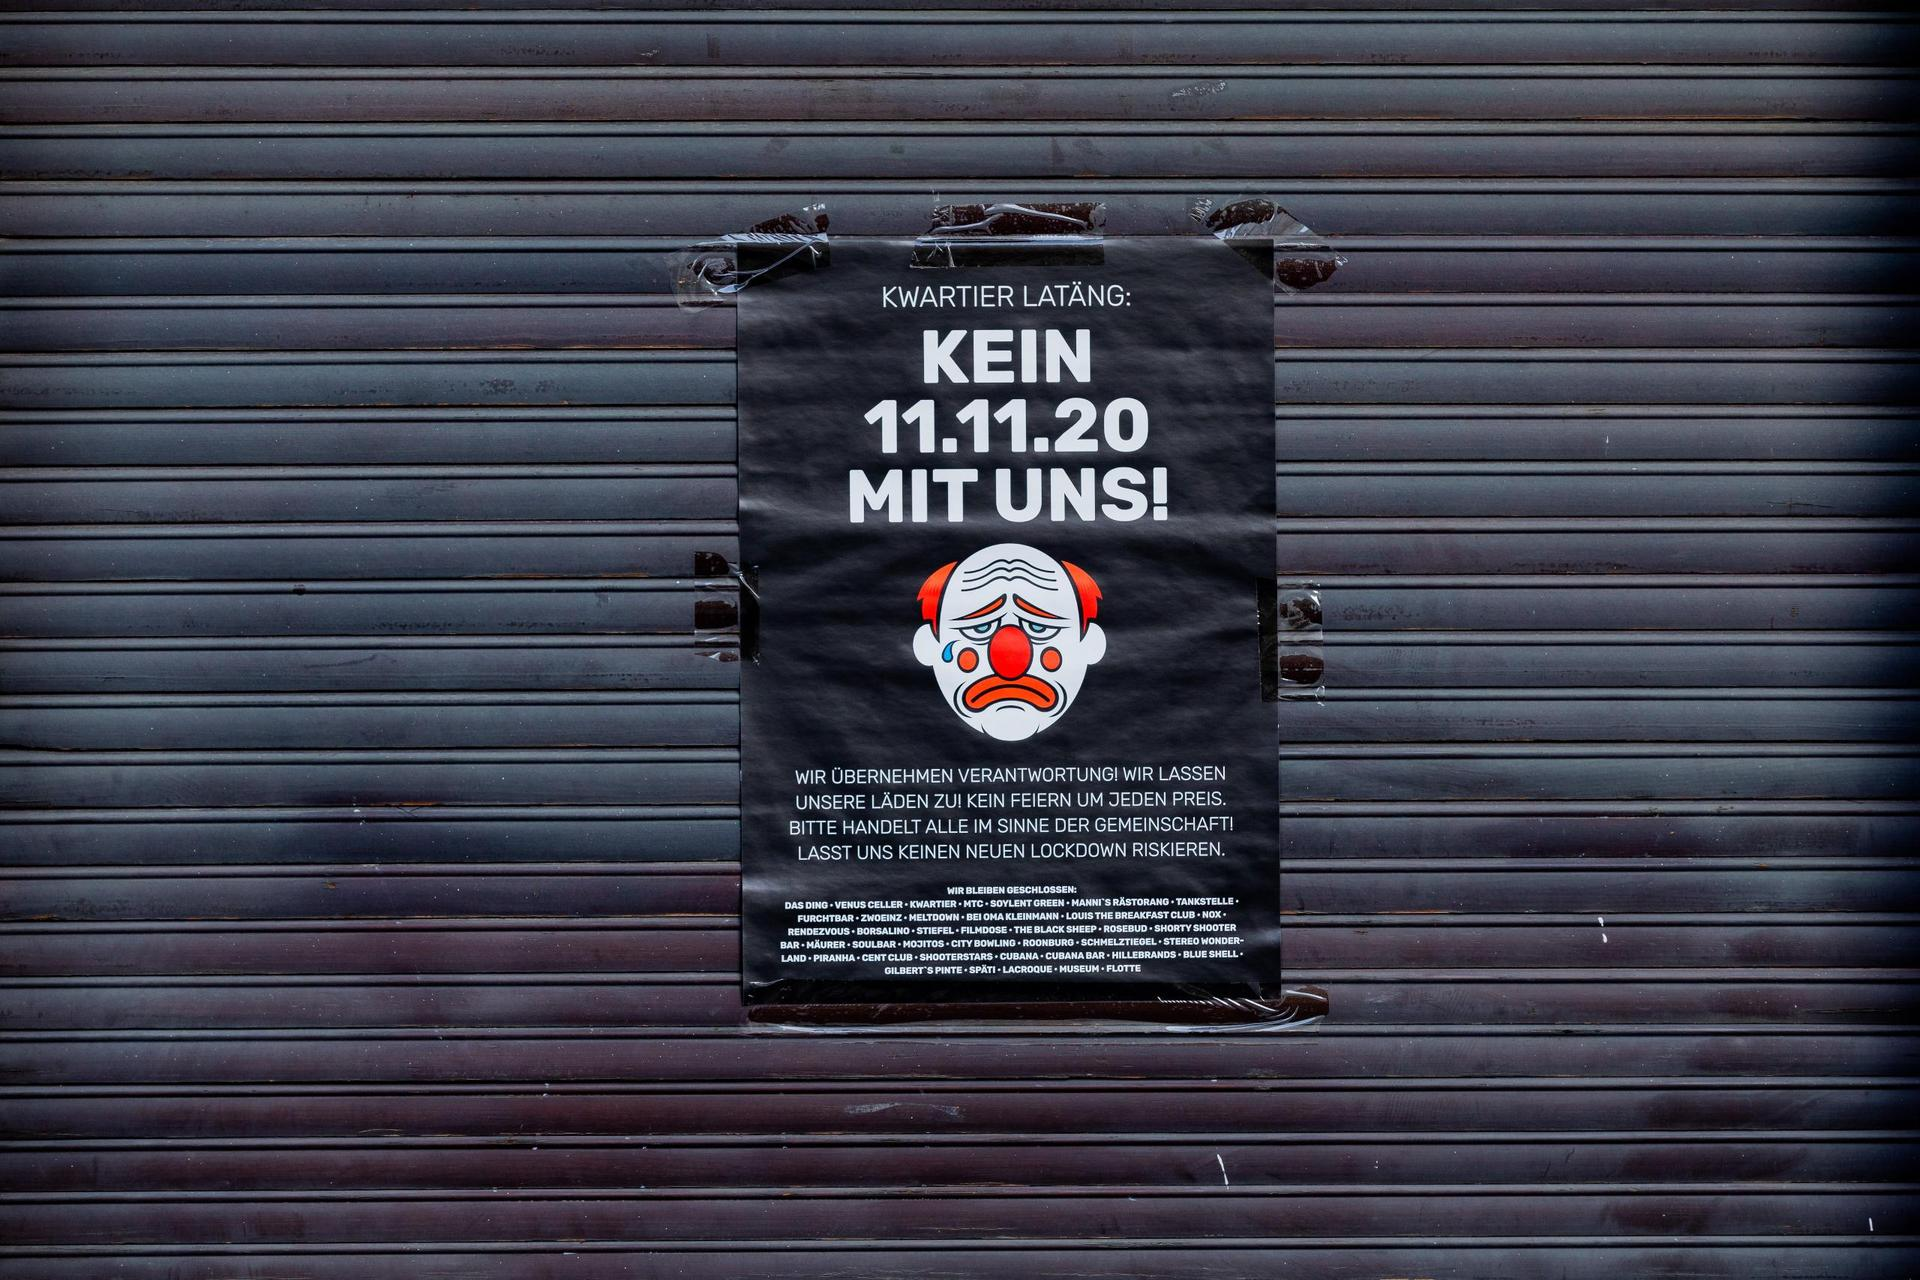 Karnevalsbeginn am 11.11. auf Sparflamme Närrische Saison